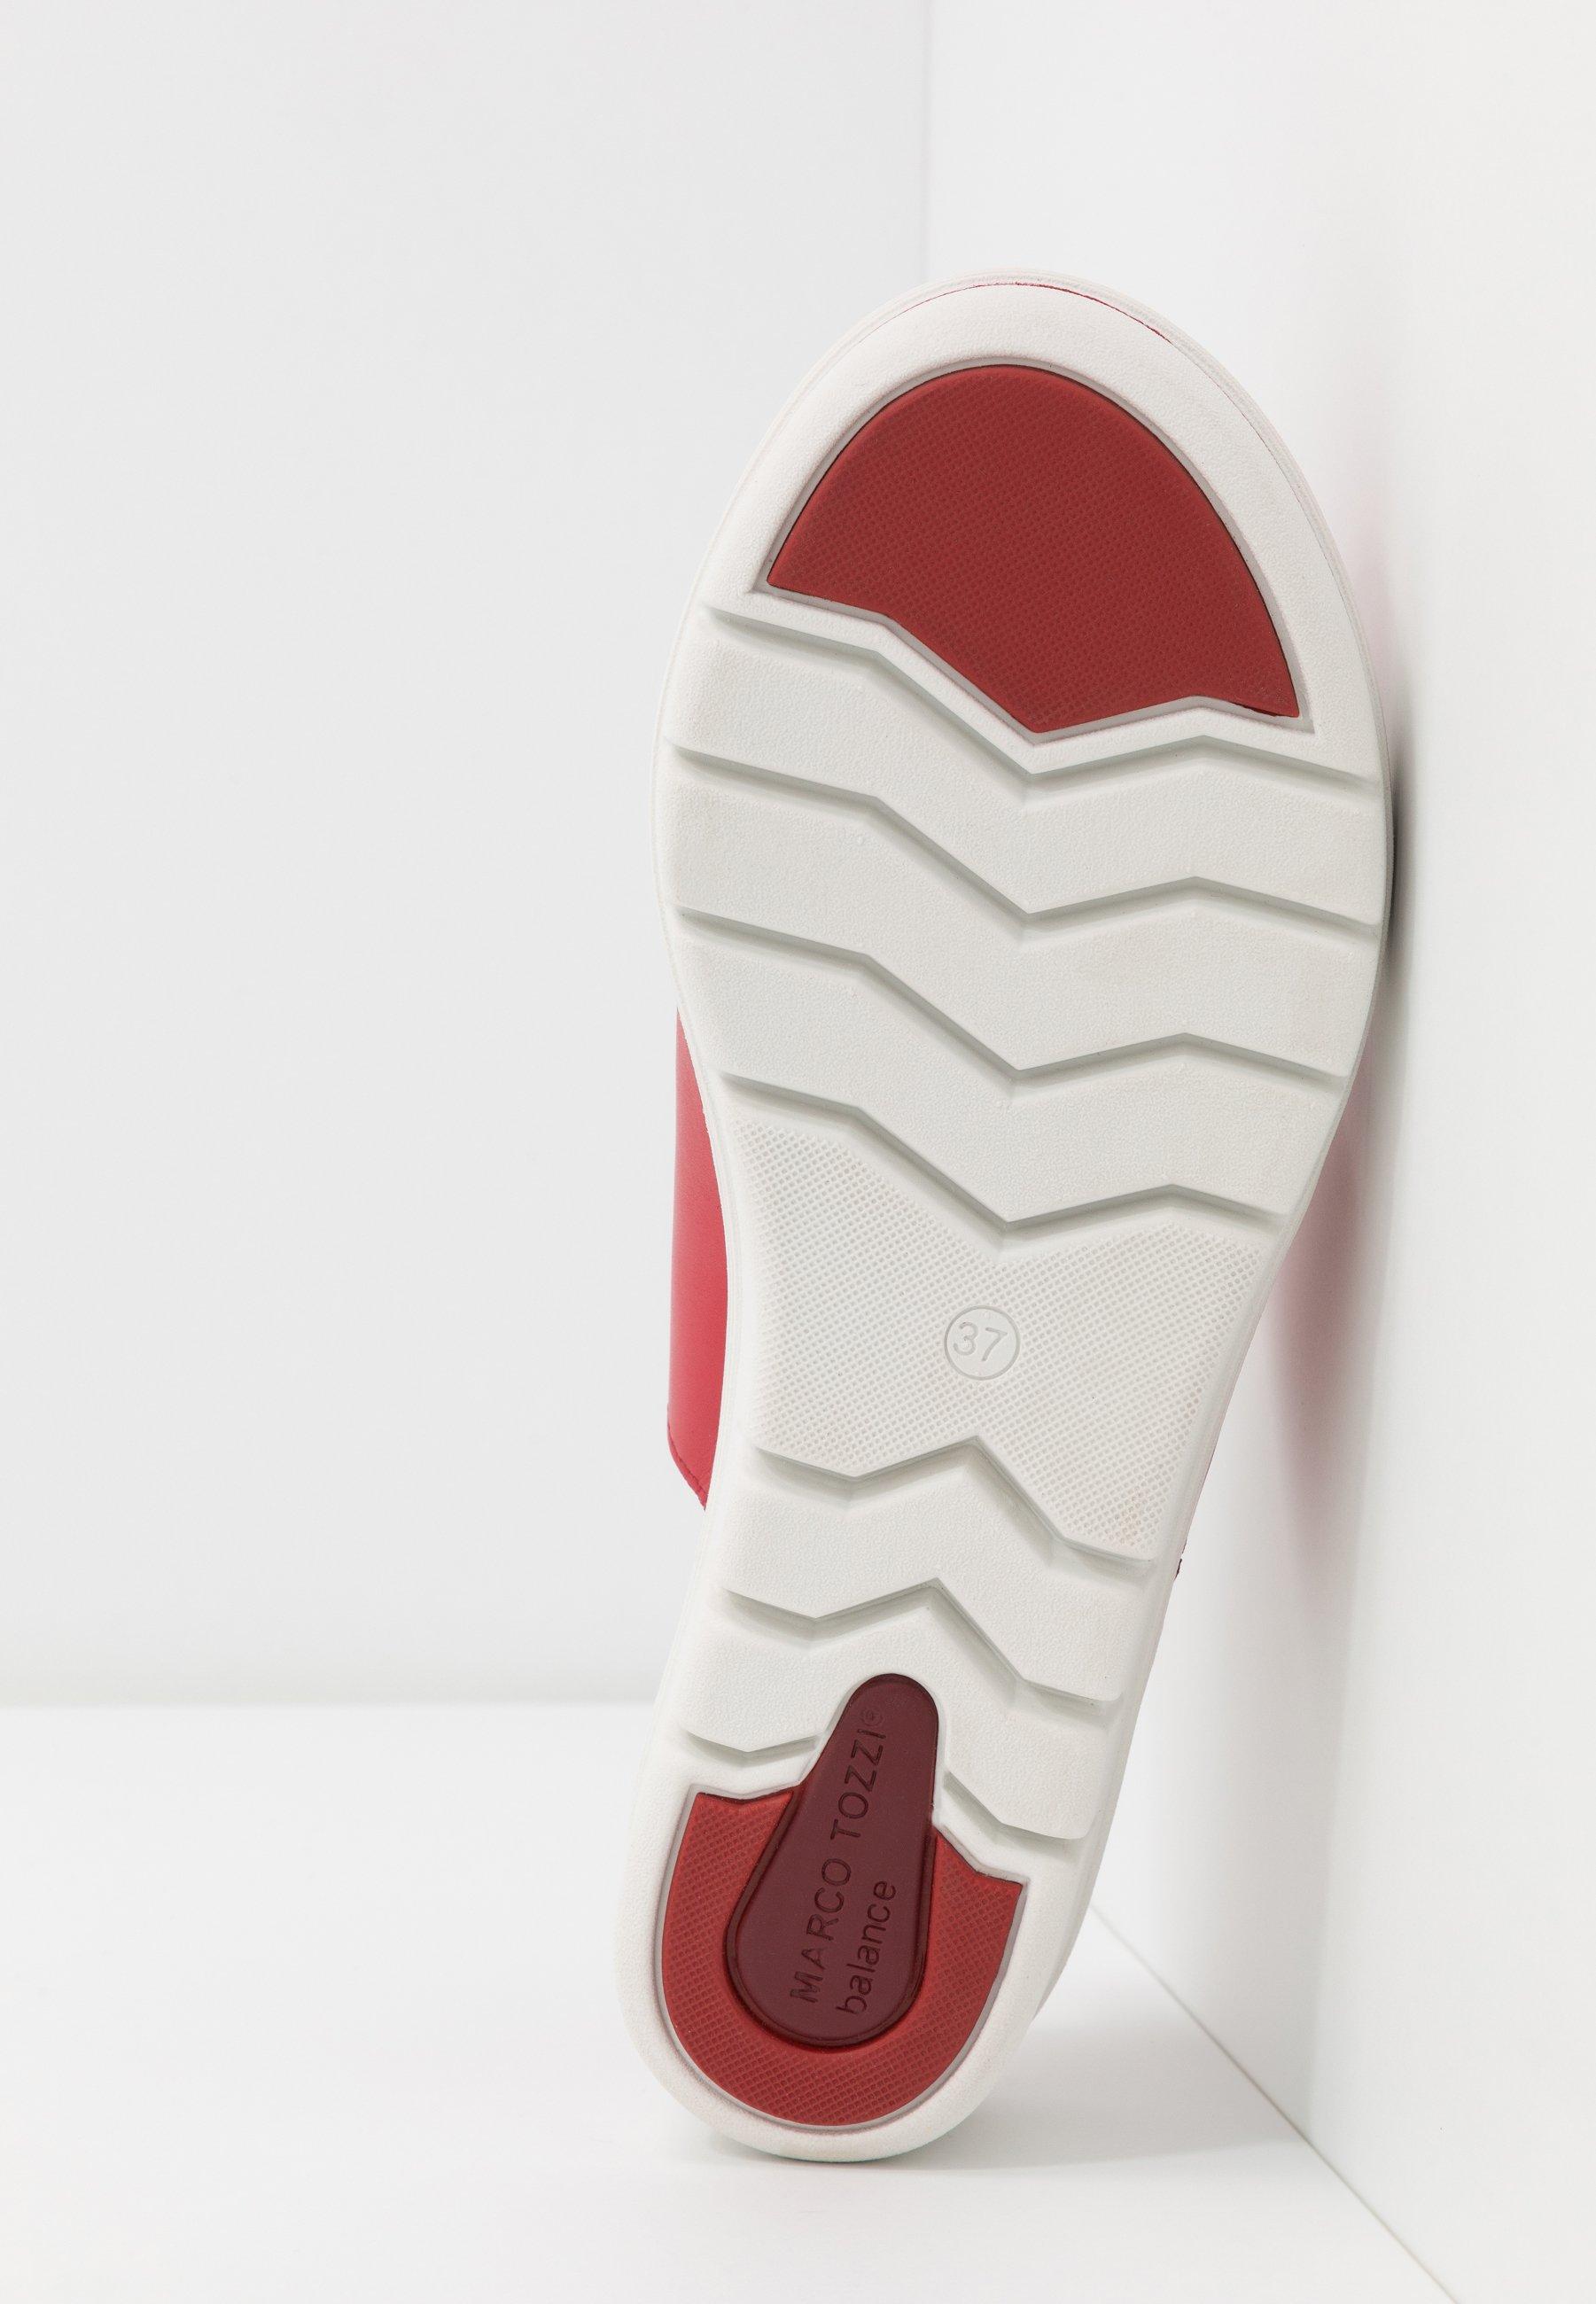 Marco Tozzi Pantolette hoch chili/rot